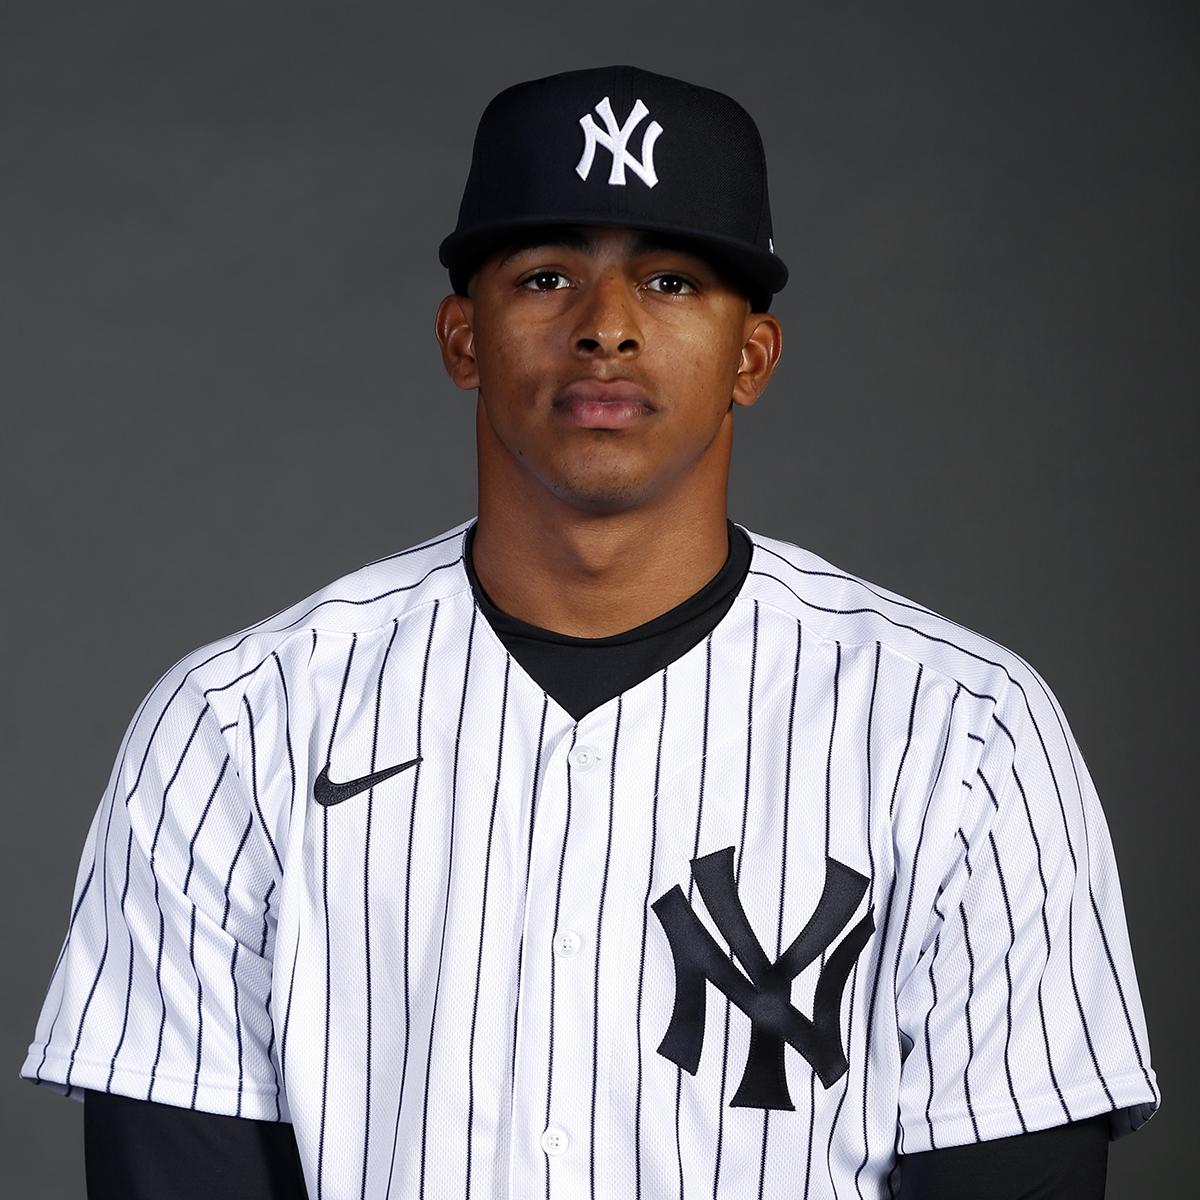 New York Yankes, Luis Medina